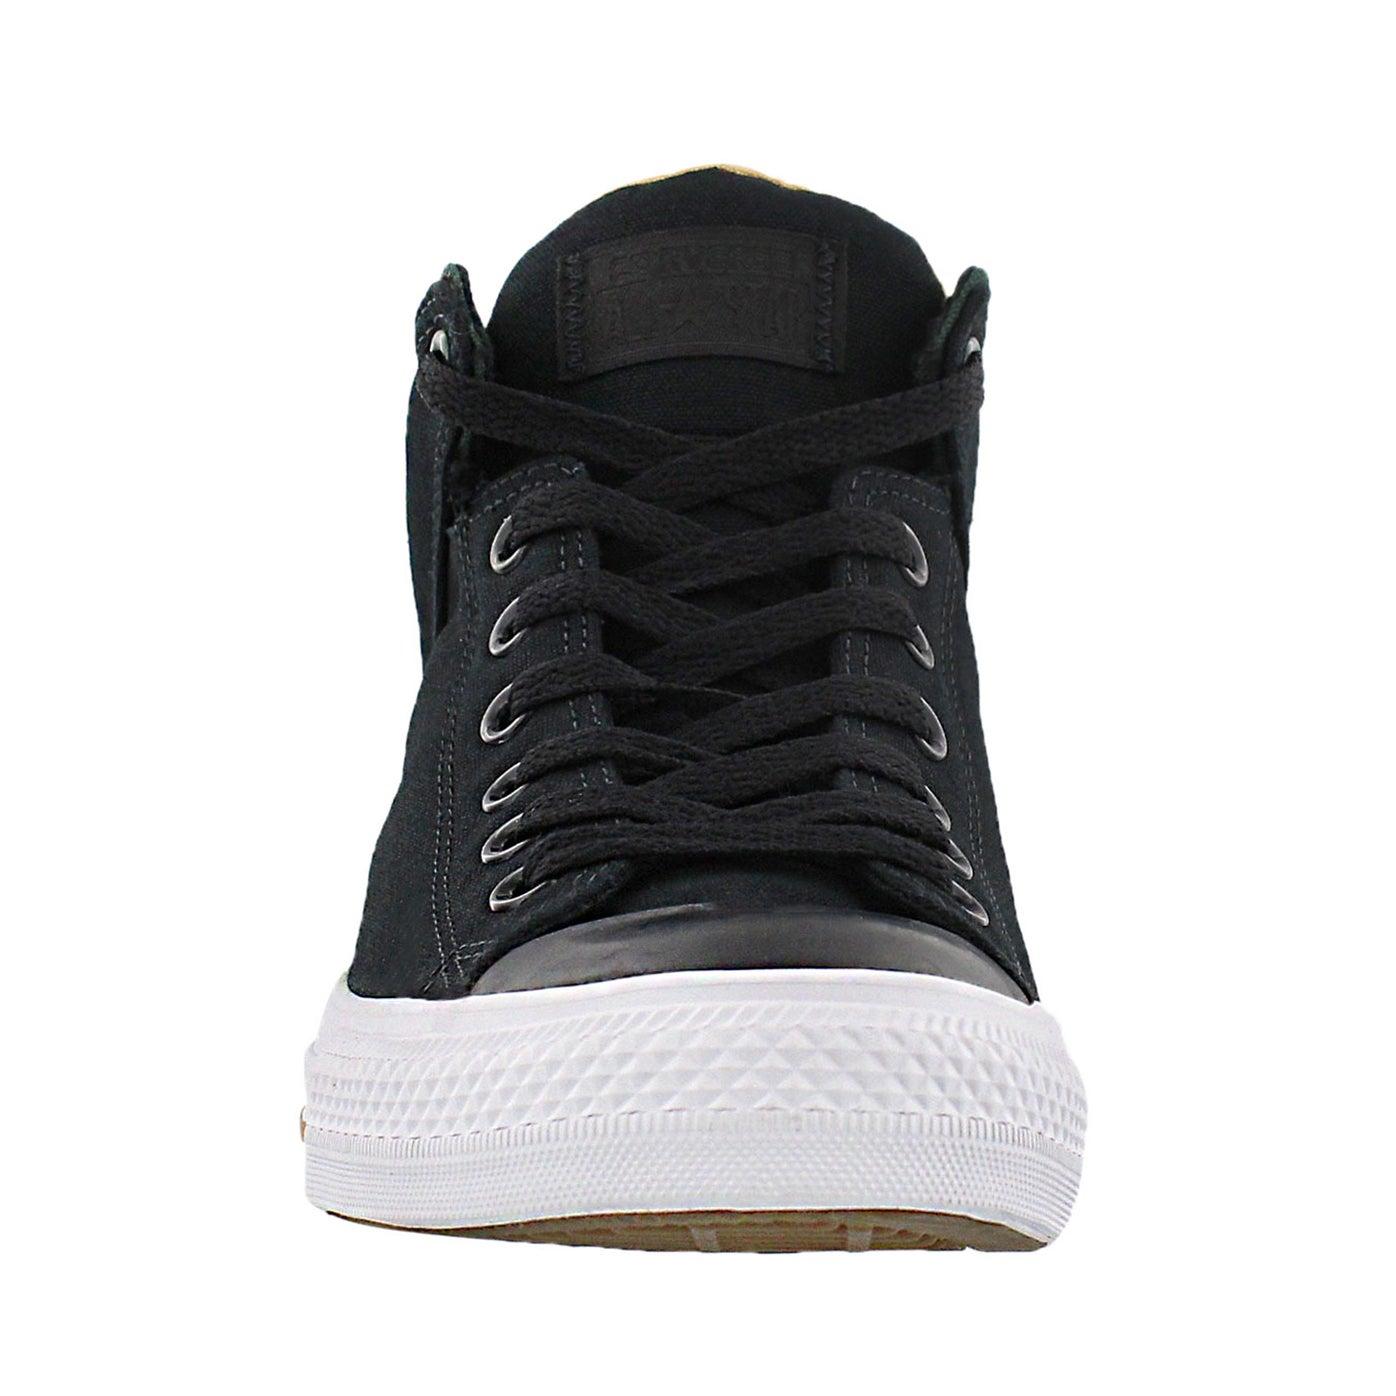 Mns CT A/S High Street black mid sneaker